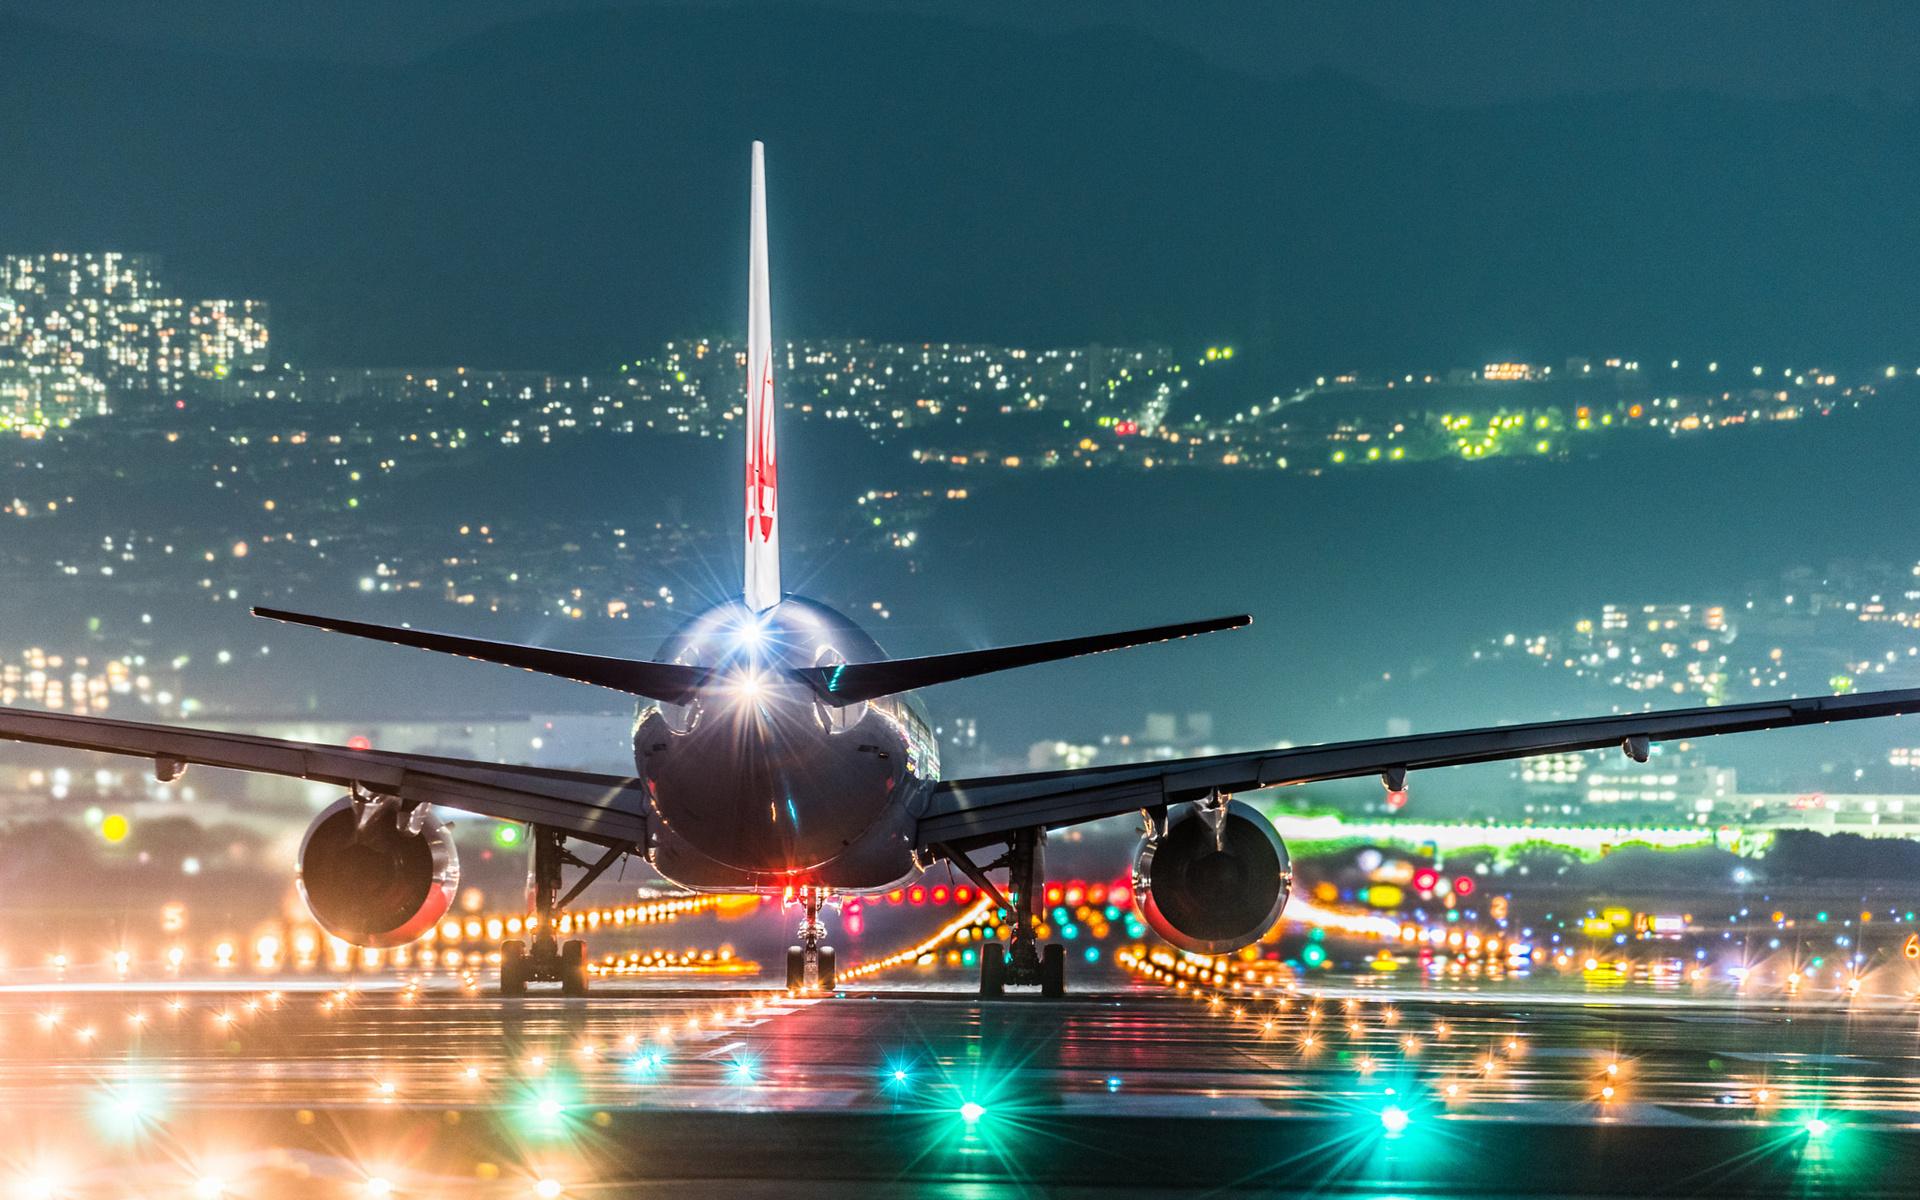 огни города и самолет